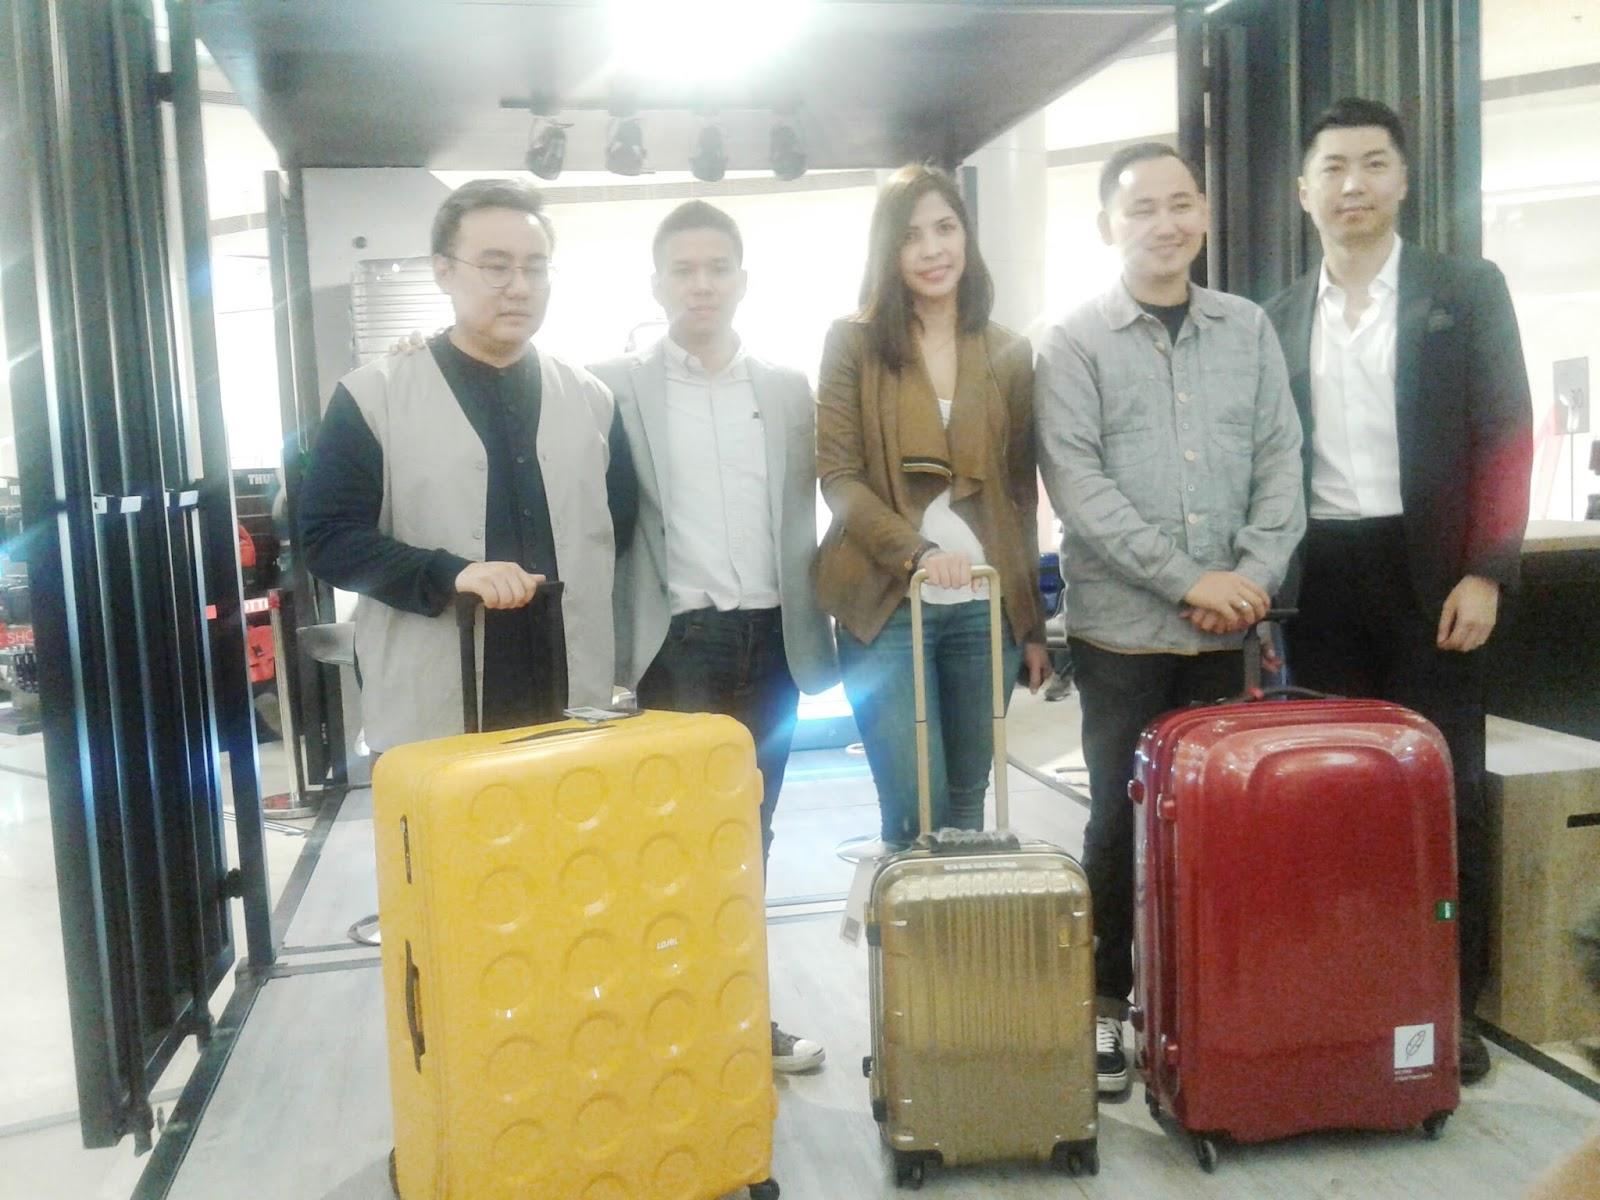 Kali ini saya mau sharing sedikit mengenai beberapa tips memilih koper maupun ransel yang tepat untuk traveling Tips ini saya dapatkan di acara Grand